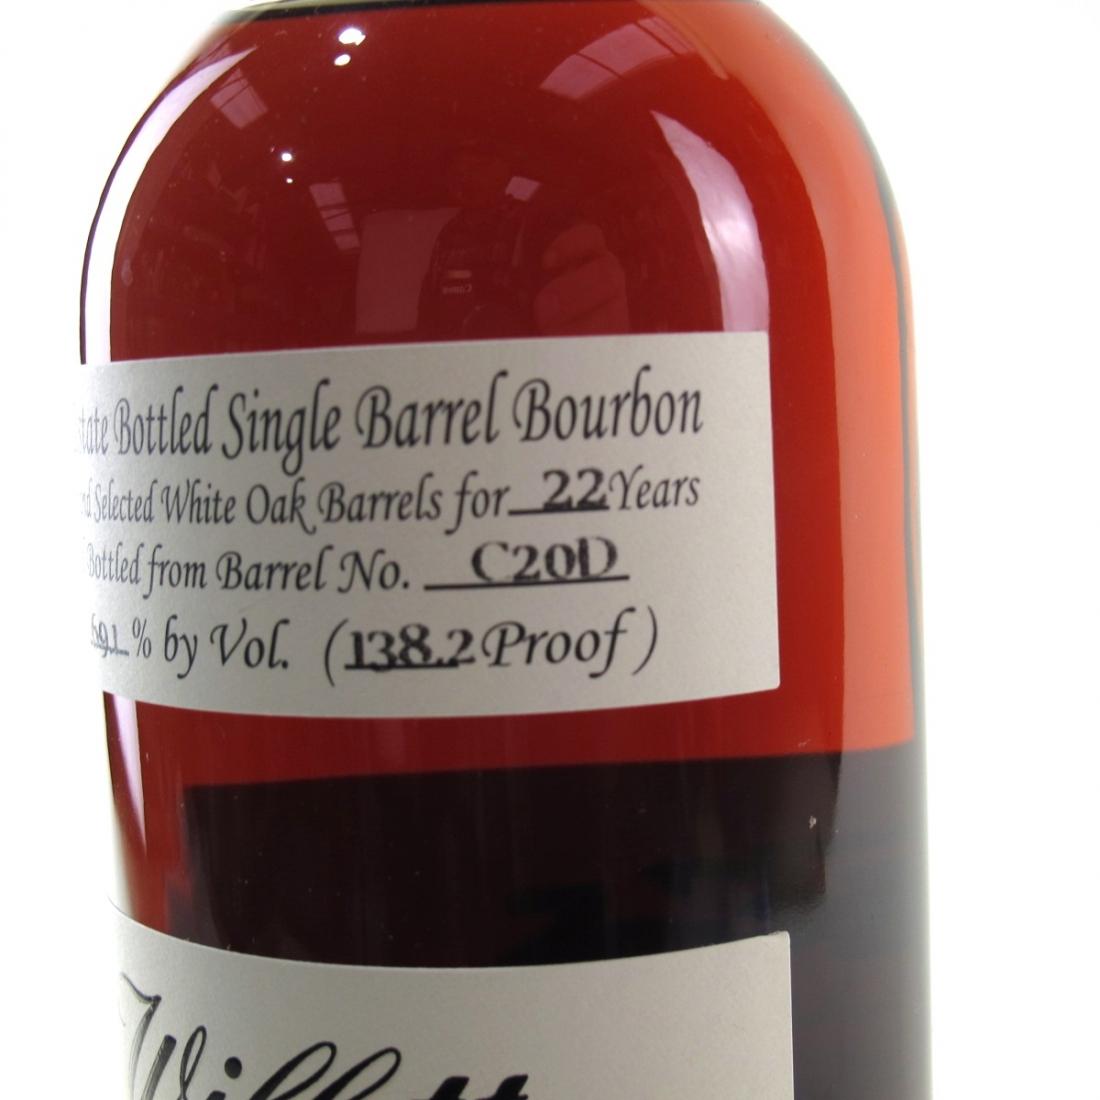 Willett Family Estate 22 Year Old Single Barrel Bourbon #C20D